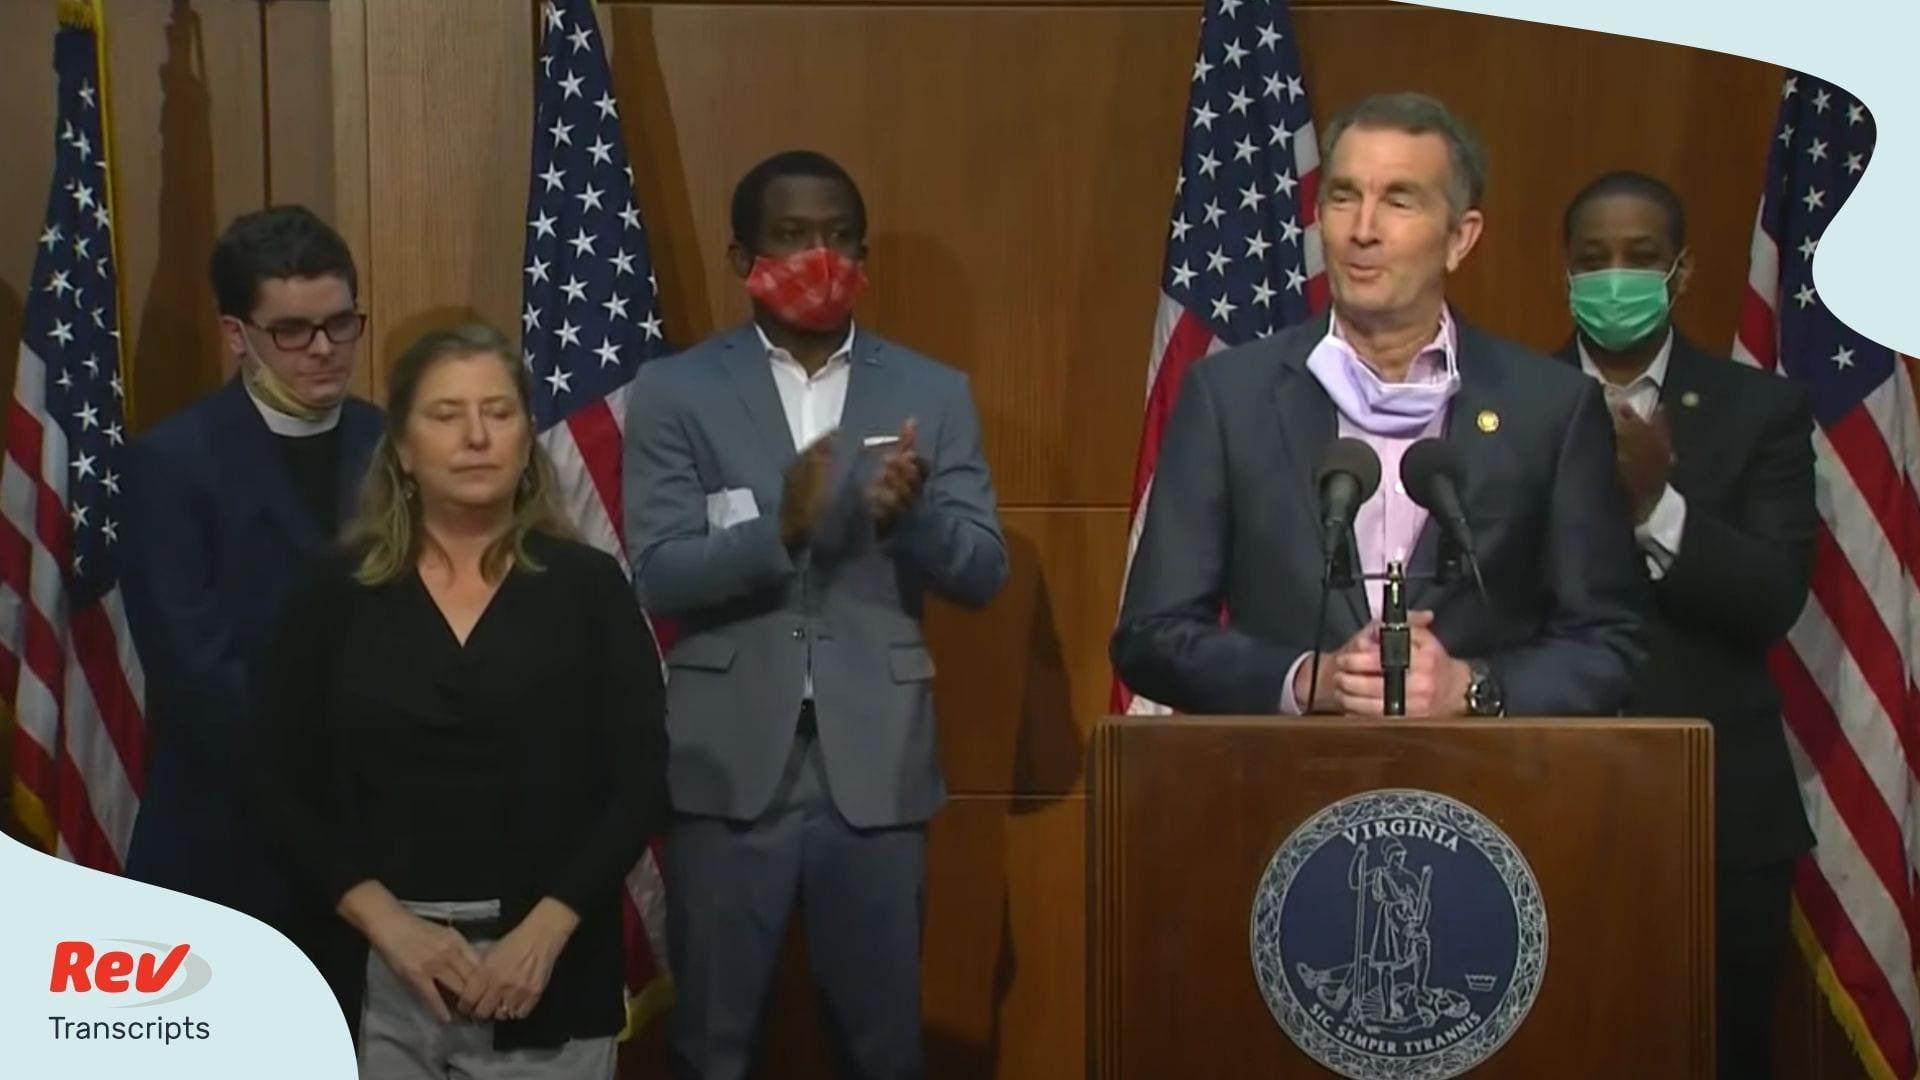 Virginia Governor Ralph Northam Announces Removal of Robert E. Lee Statue